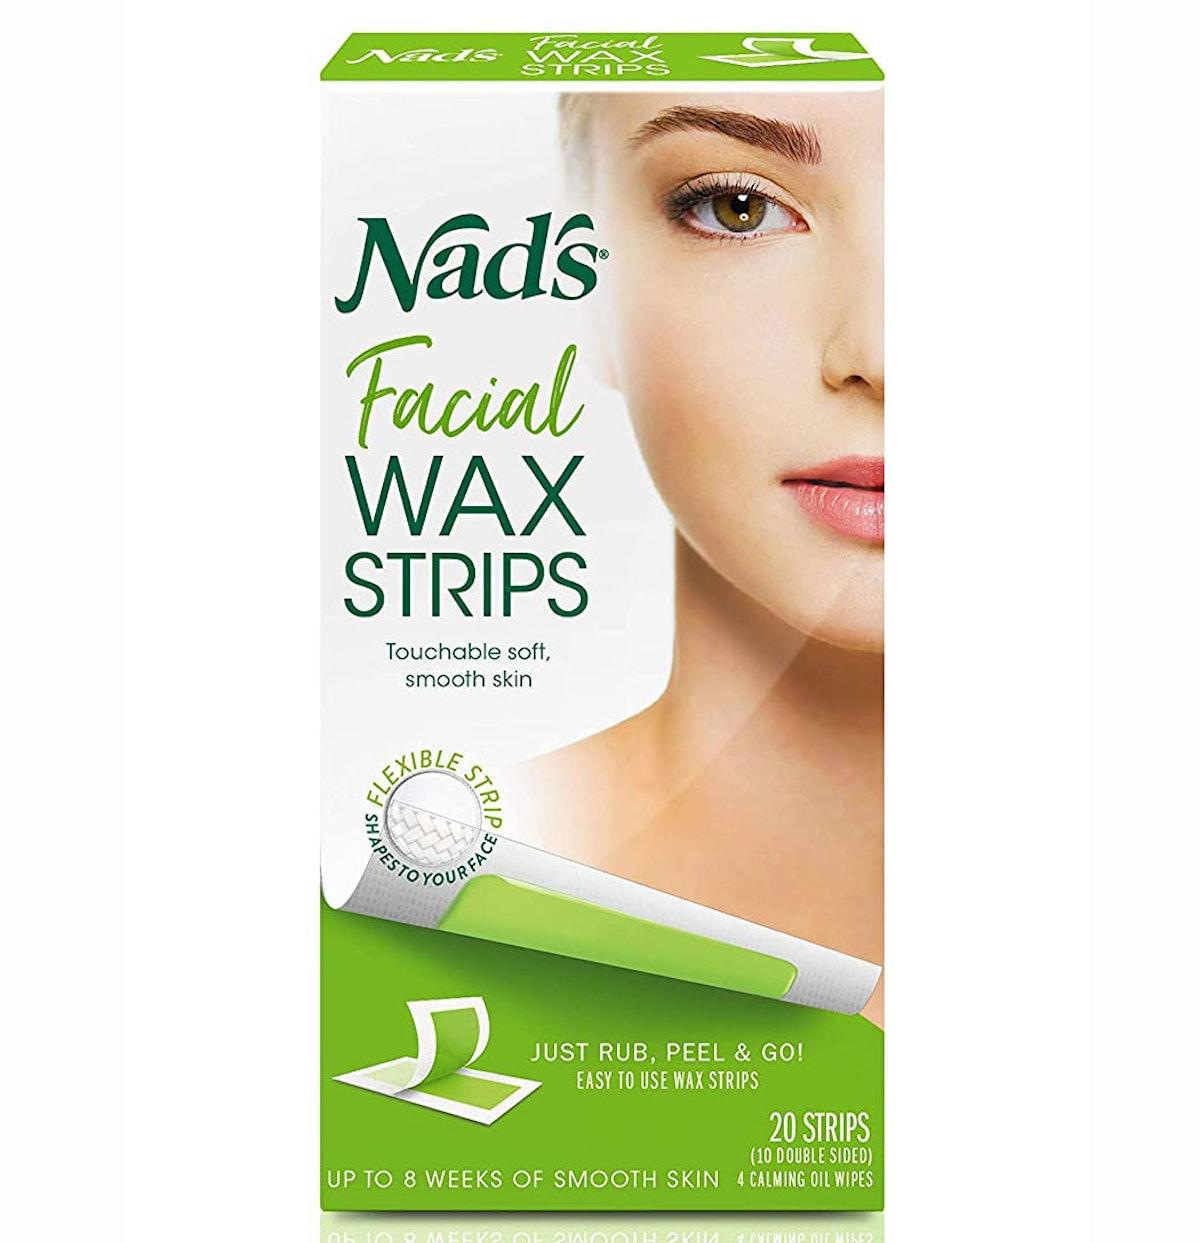 Nad's Facial Wax Strips